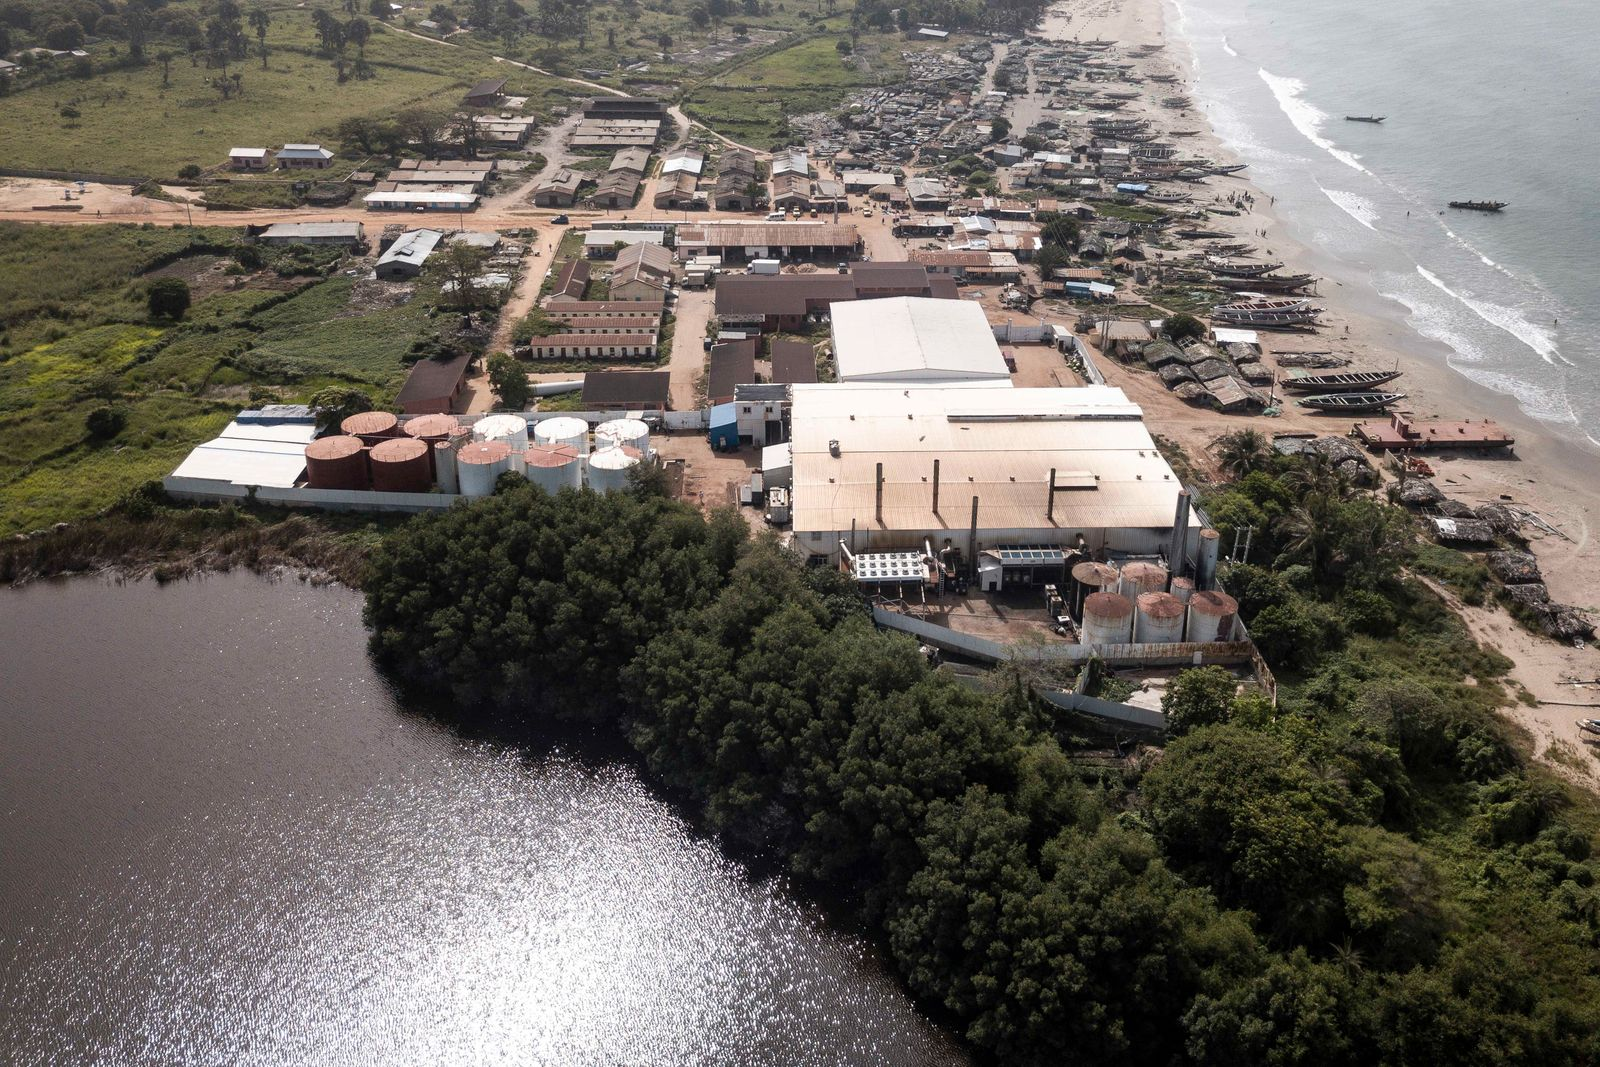 Chinese fisheries pollute Gambian coast